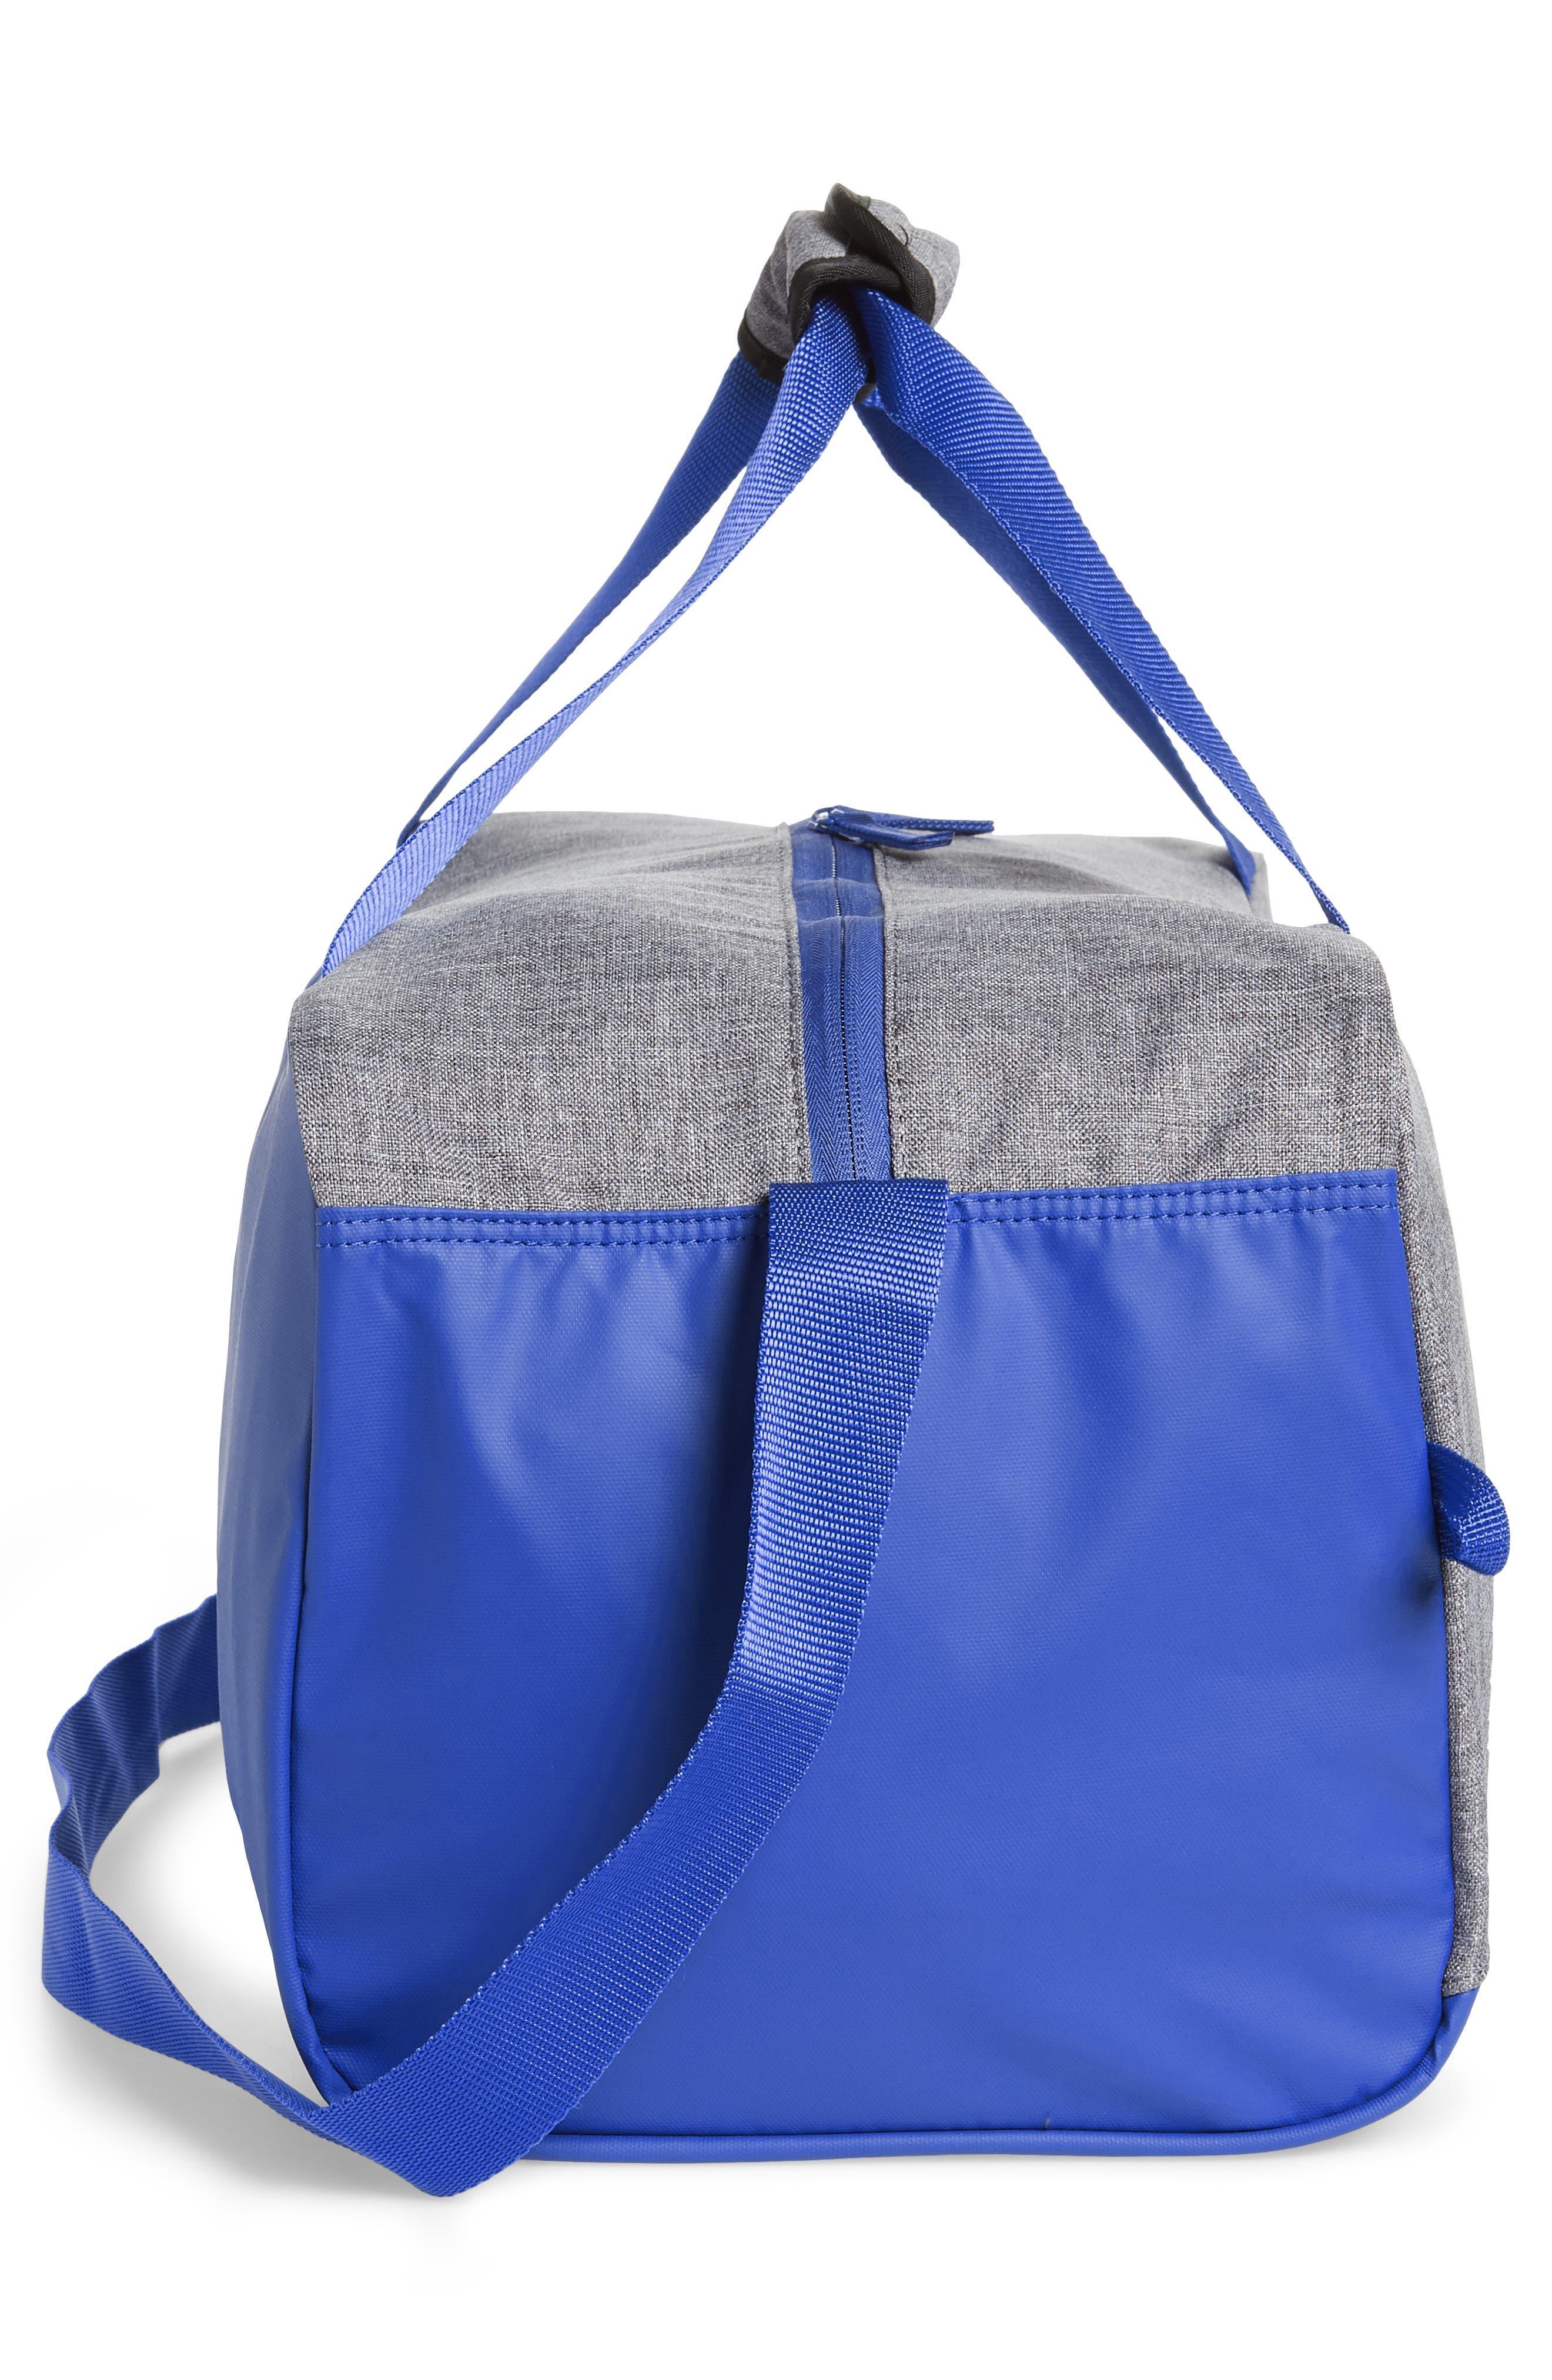 Jordan Pivot Duffle Bag,                             Alternate thumbnail 4, color,                             431